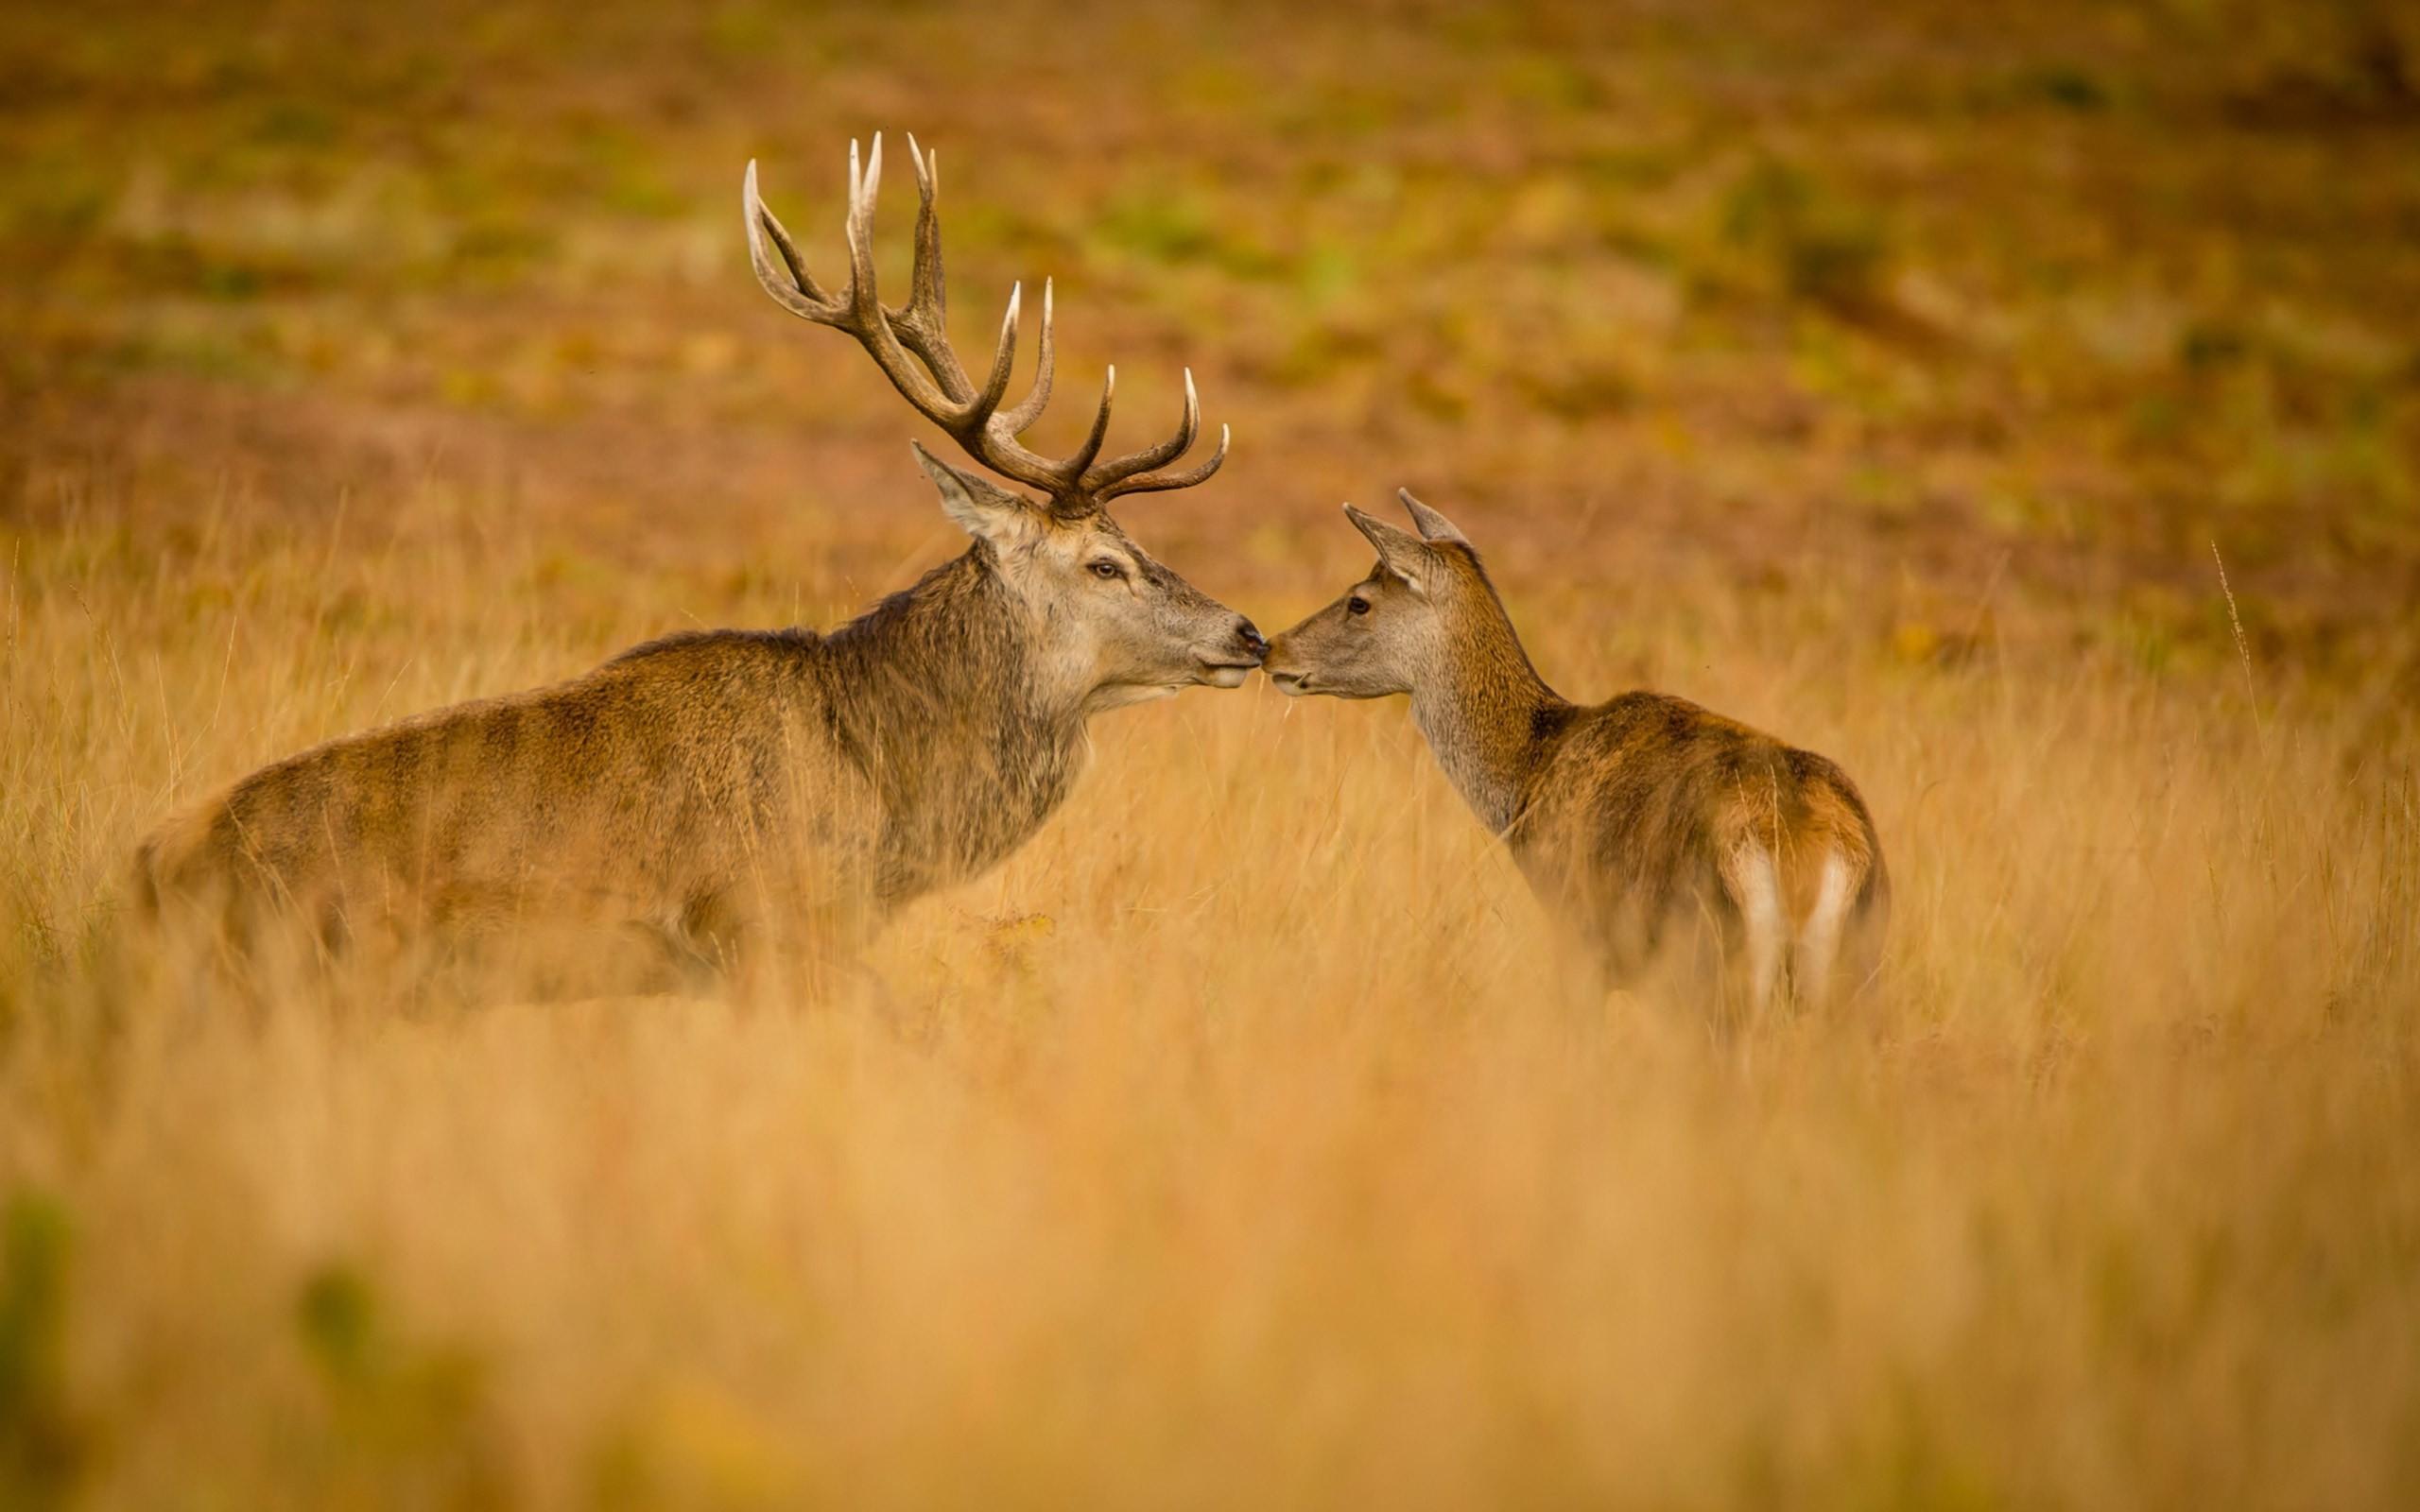 2017-03-03 – deer wallpaper – Full HD Backgrounds, #1856199